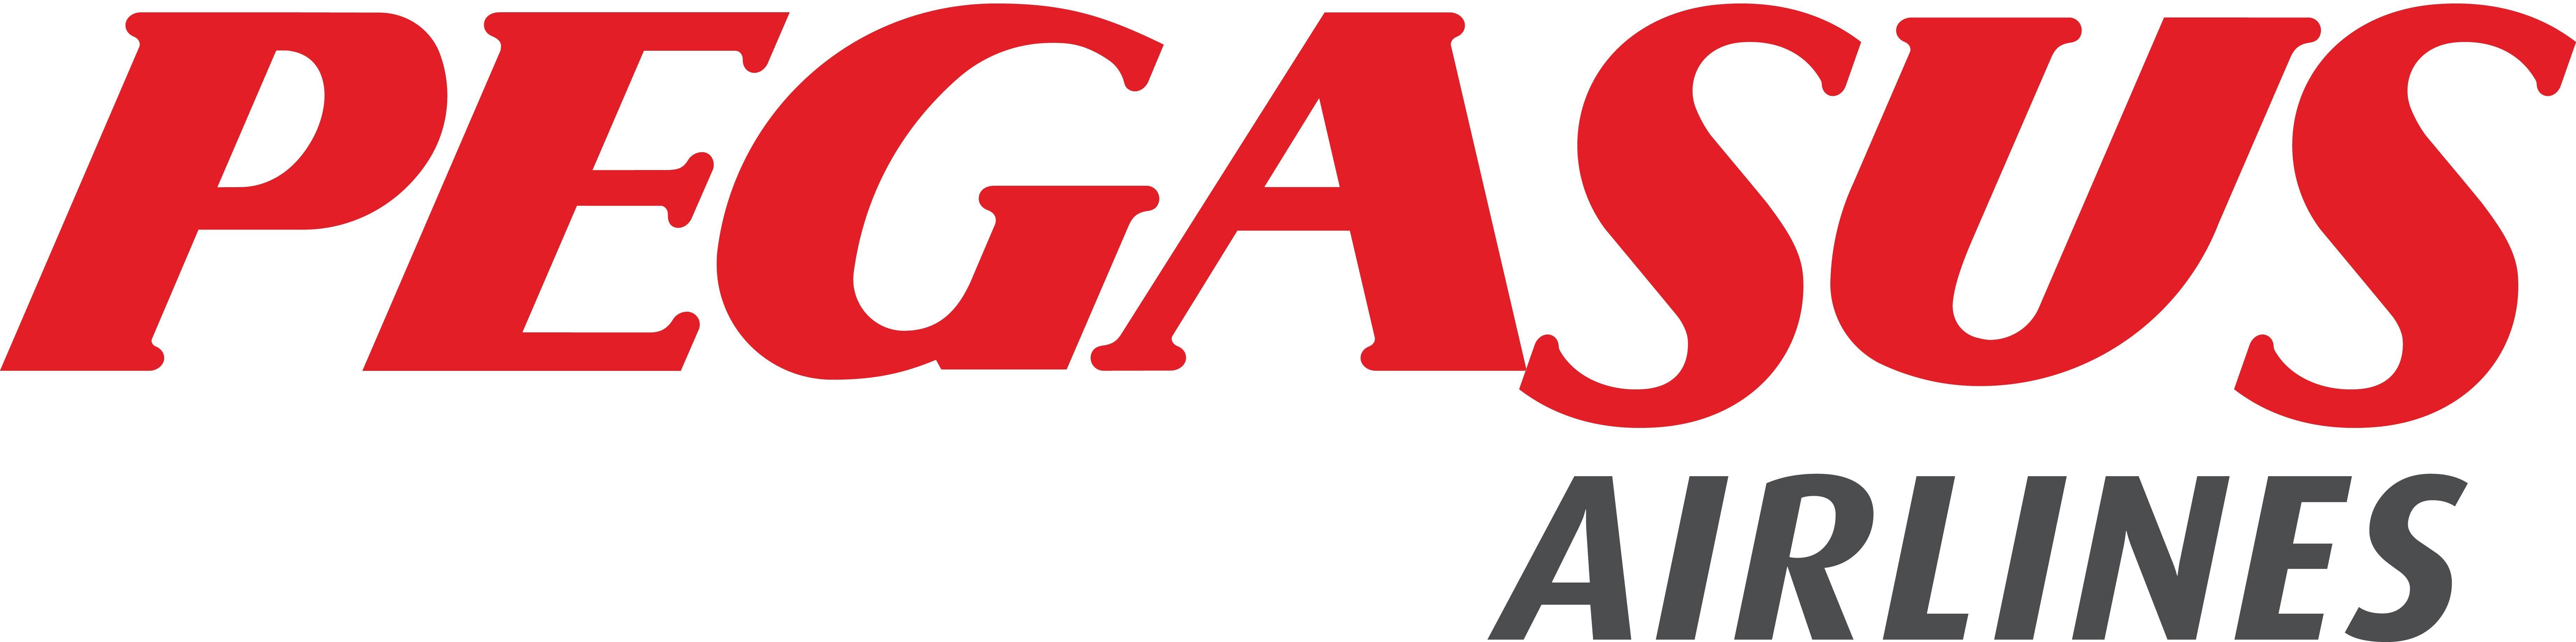 http://www.haberekonomi.com.tr/resimler/image/PGS-logo%5B1%5D.jpg